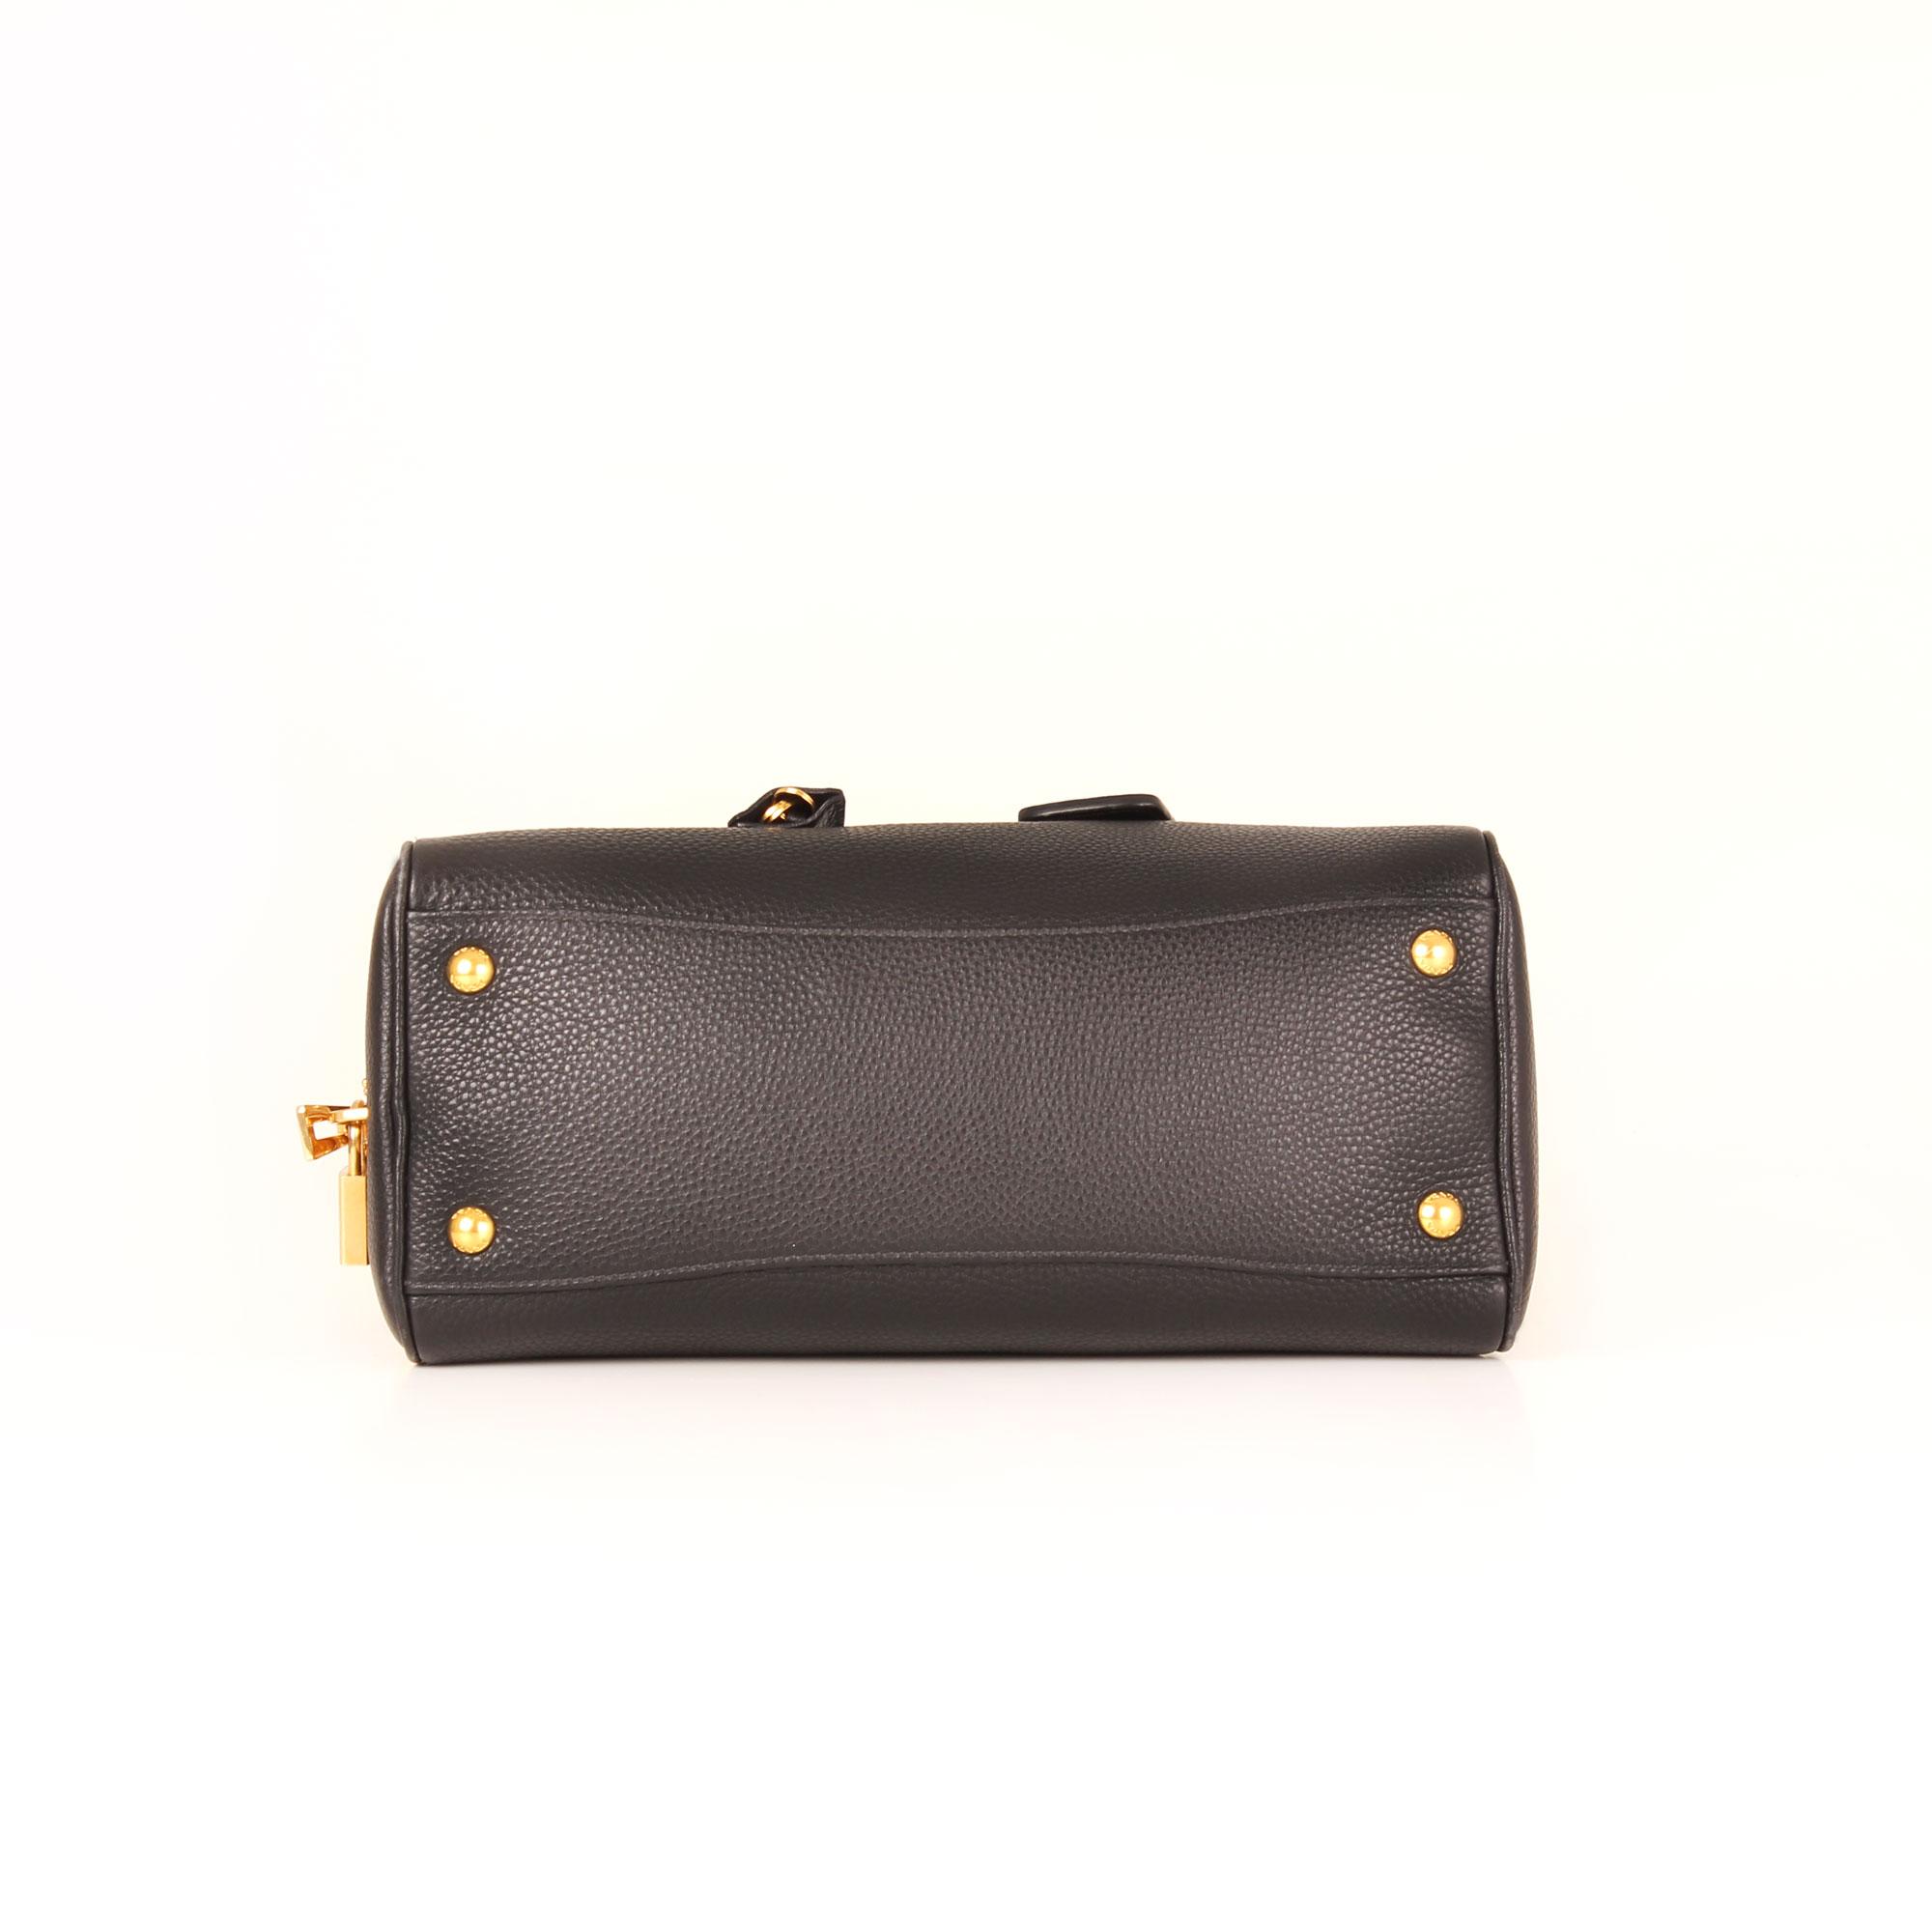 426240cbbf5a4 Prada Vitello Daino Black leather